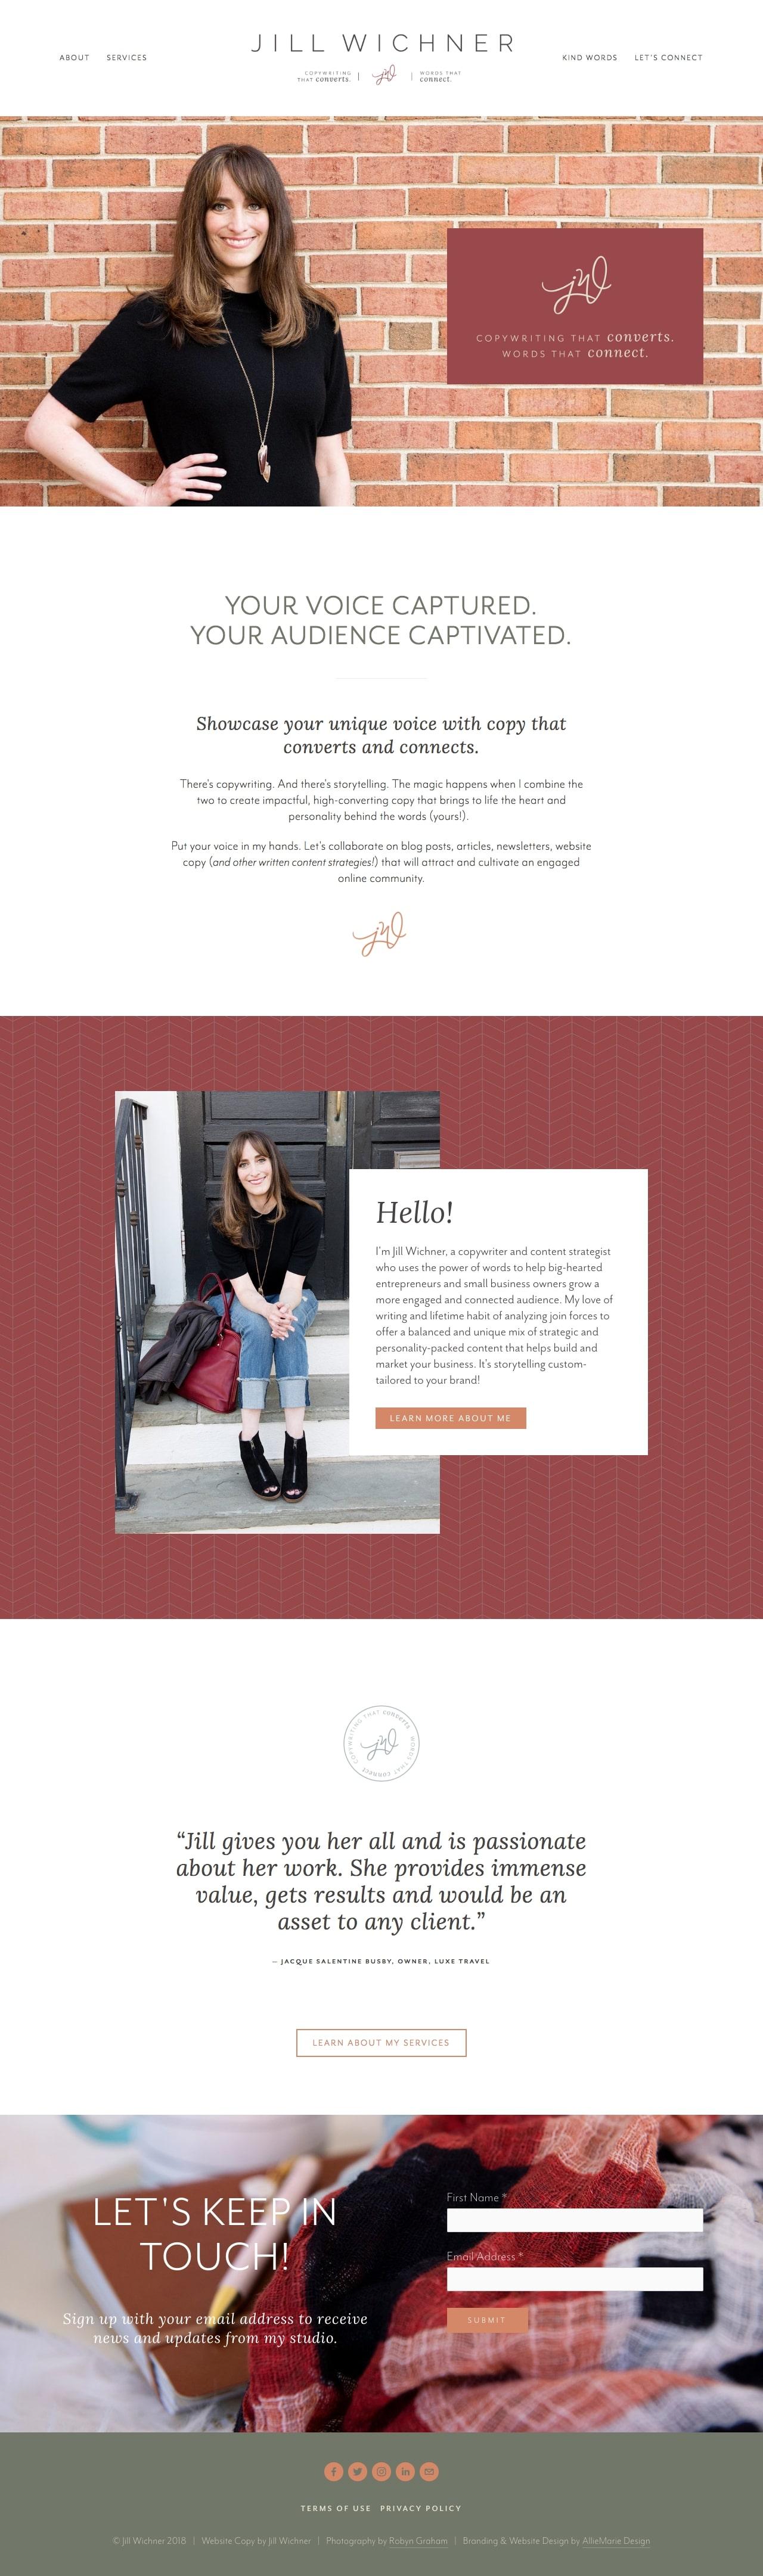 Jill-Wichner-Best-Example-of-Squarespace-Website-for-Marketing-Website.jpg